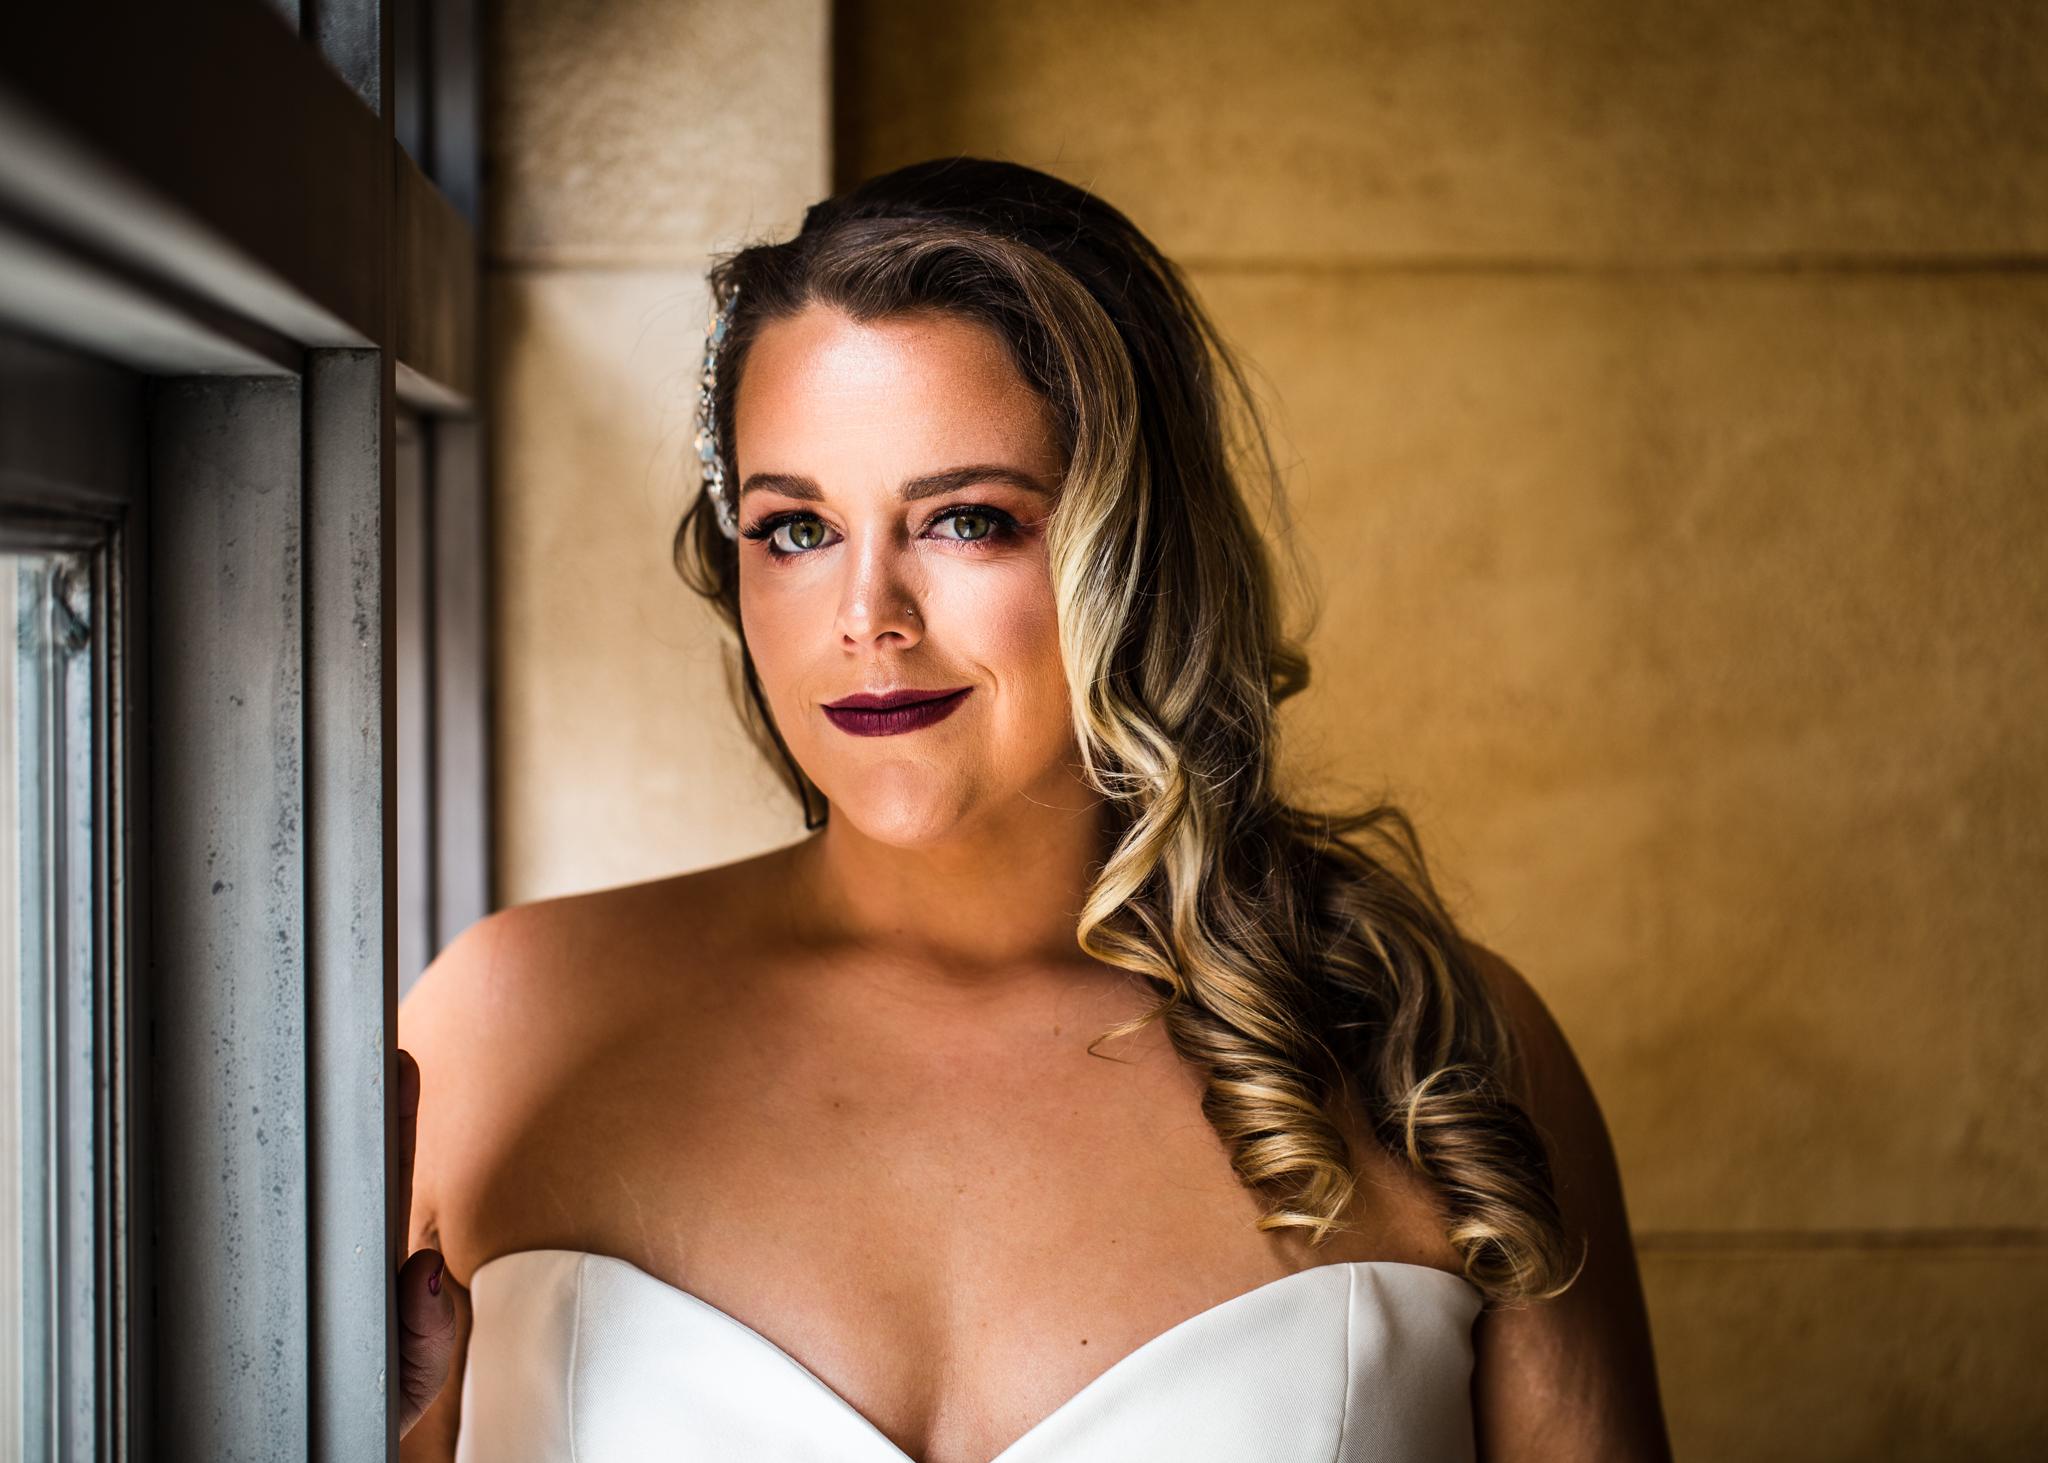 Hair & Makeup - Dani Jo Bell Makeup Artistry Kati Swegel Makeup ArtistBronzed and BlushedWhite Carpet BrideParadise Makeup, Hair, & Airbrush TanningThe Pretty Bride Co.